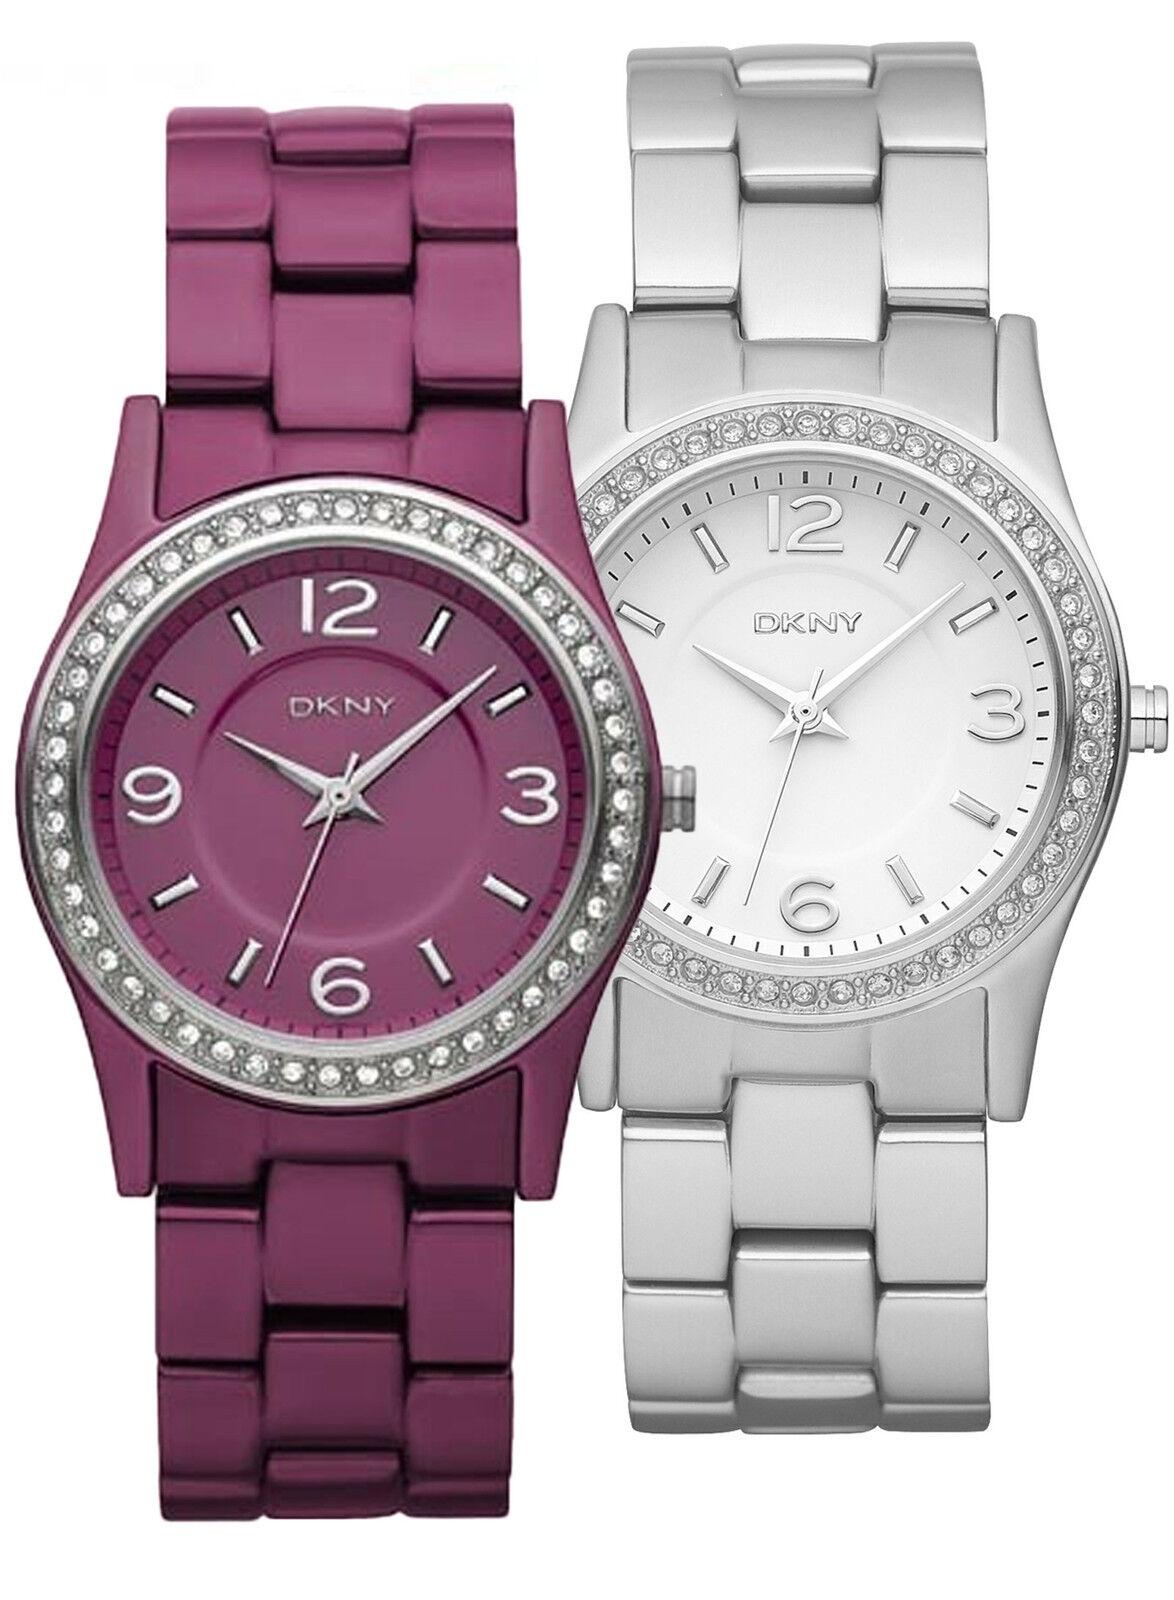 DKNY Women's Glitz Aluminum Fashion Watch-Choice of Purple or Silver